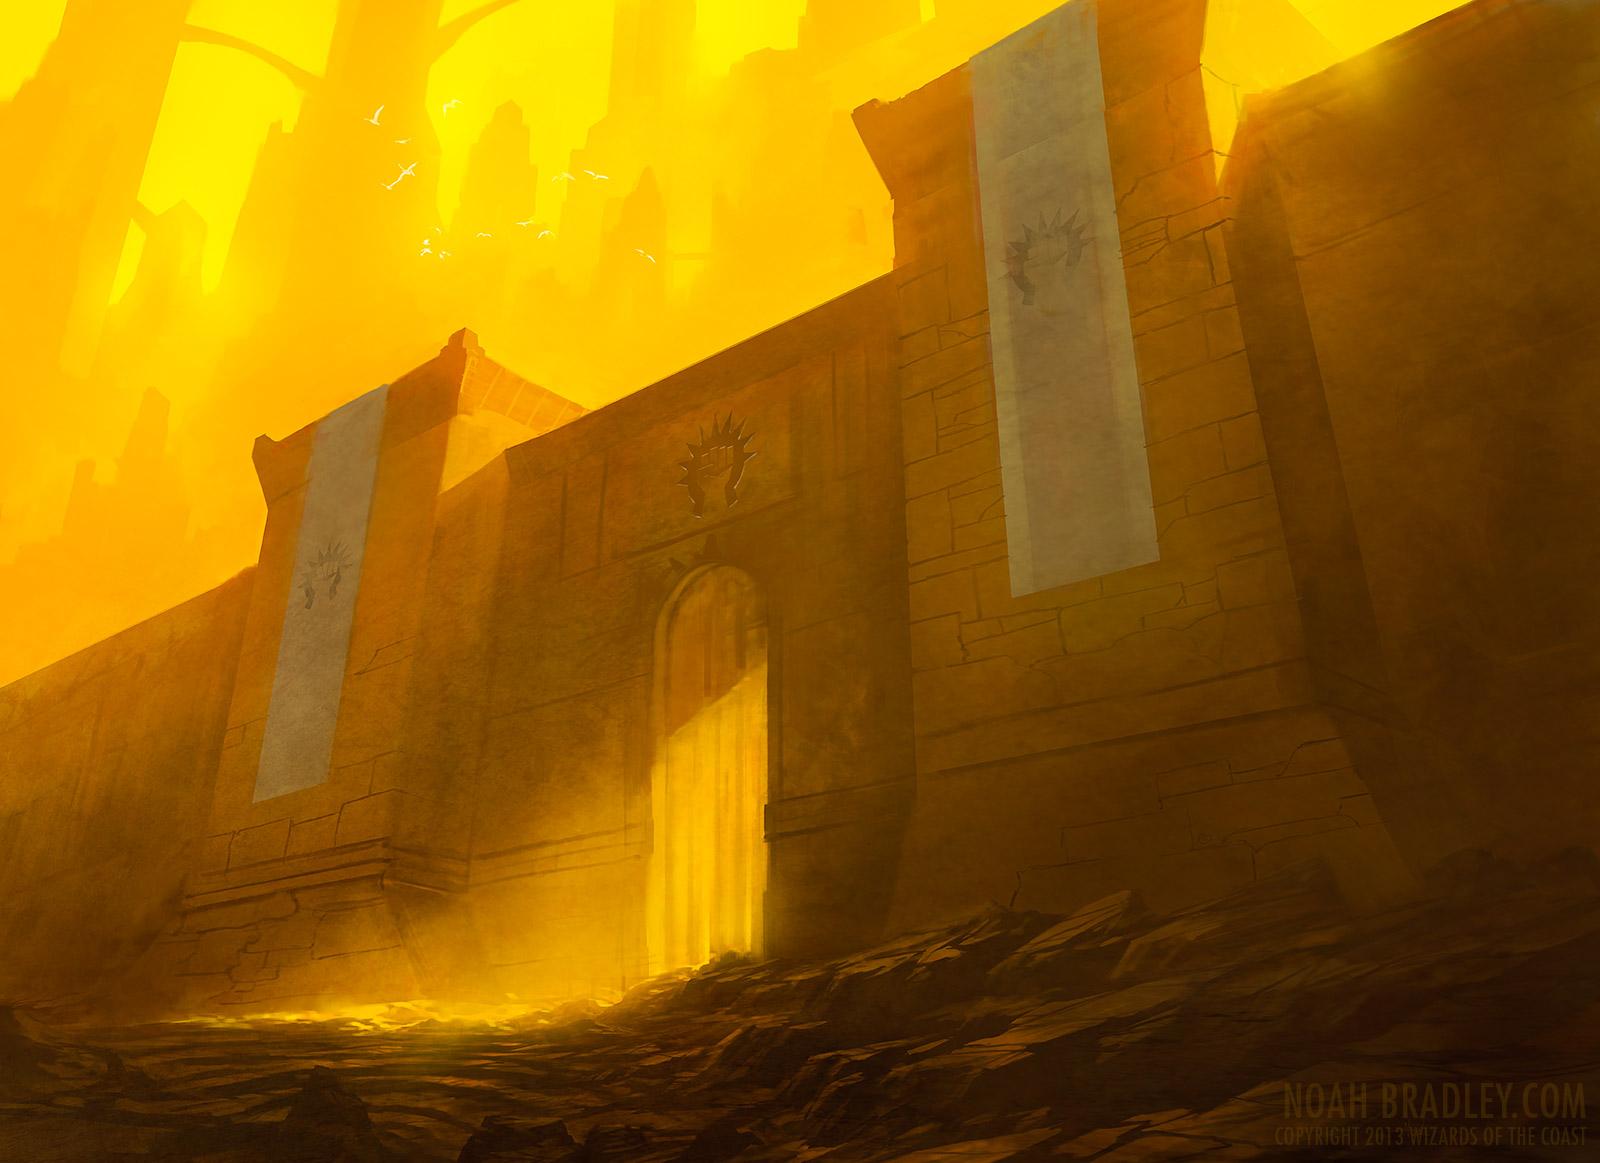 Boros Guildgate by noahbradley